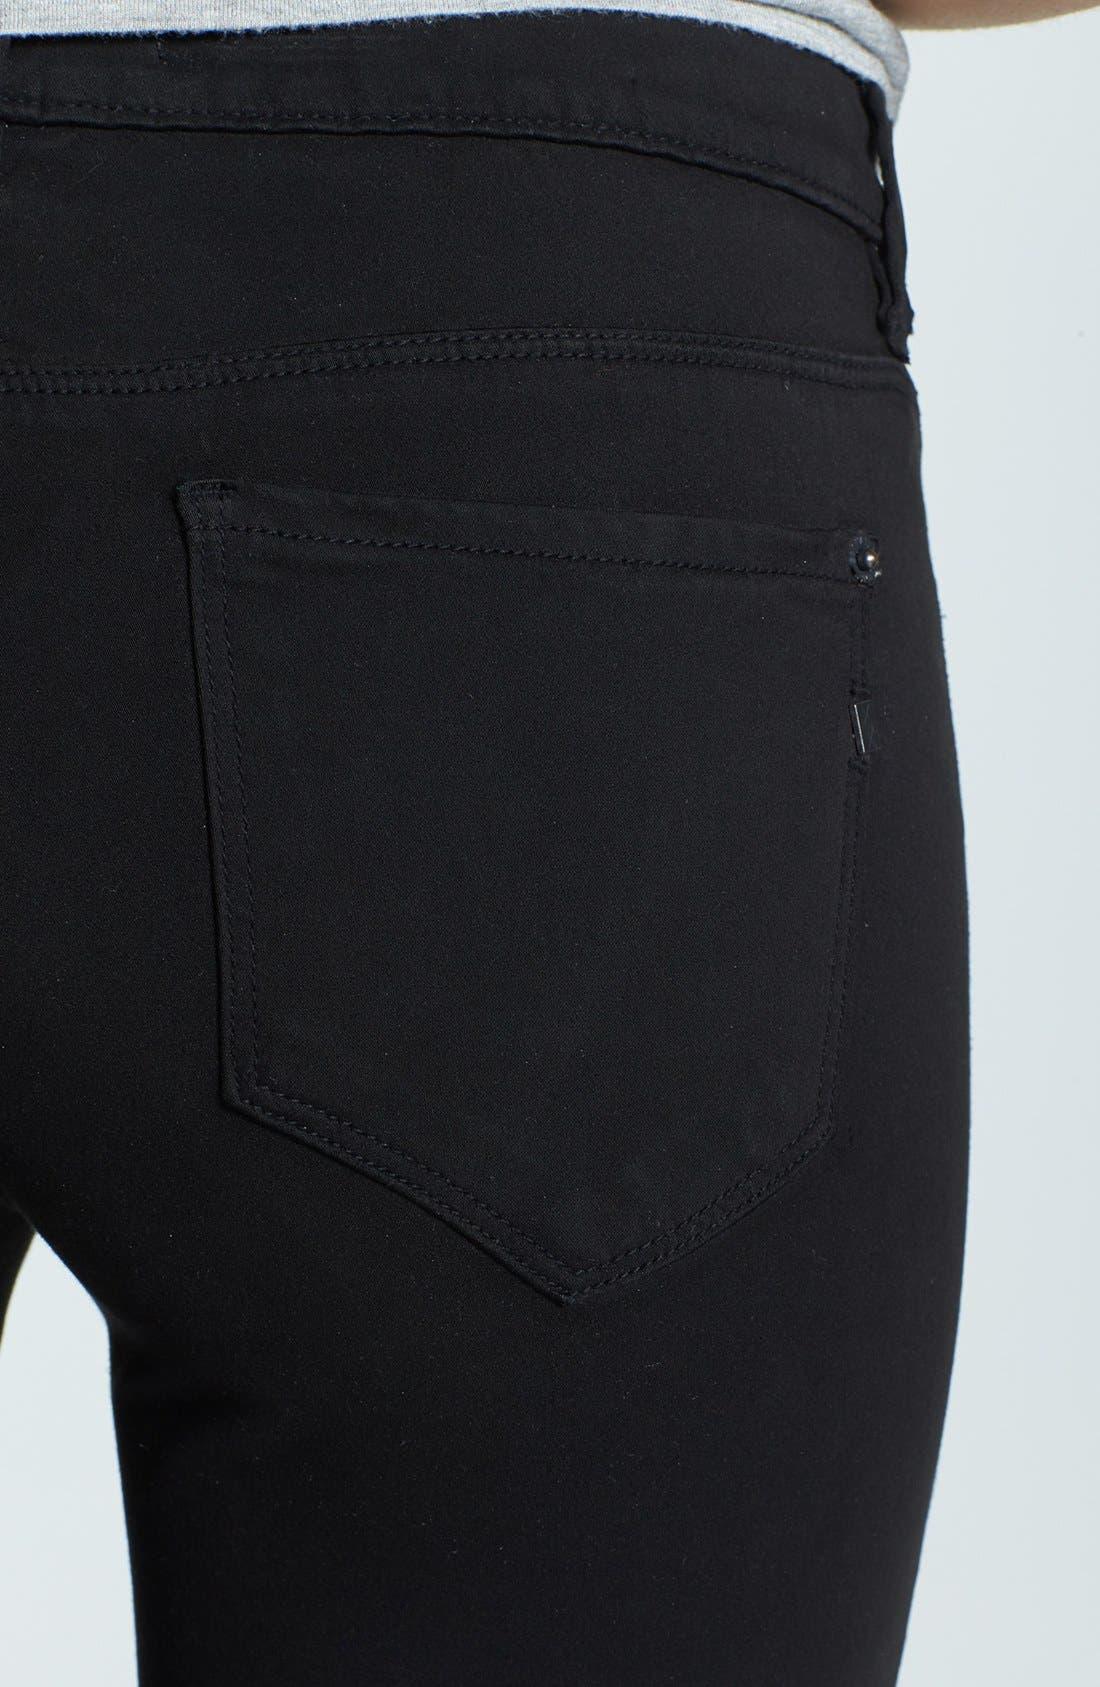 Alternate Image 3  - Genetic 'Shya' Cigarette Skinny Jeans